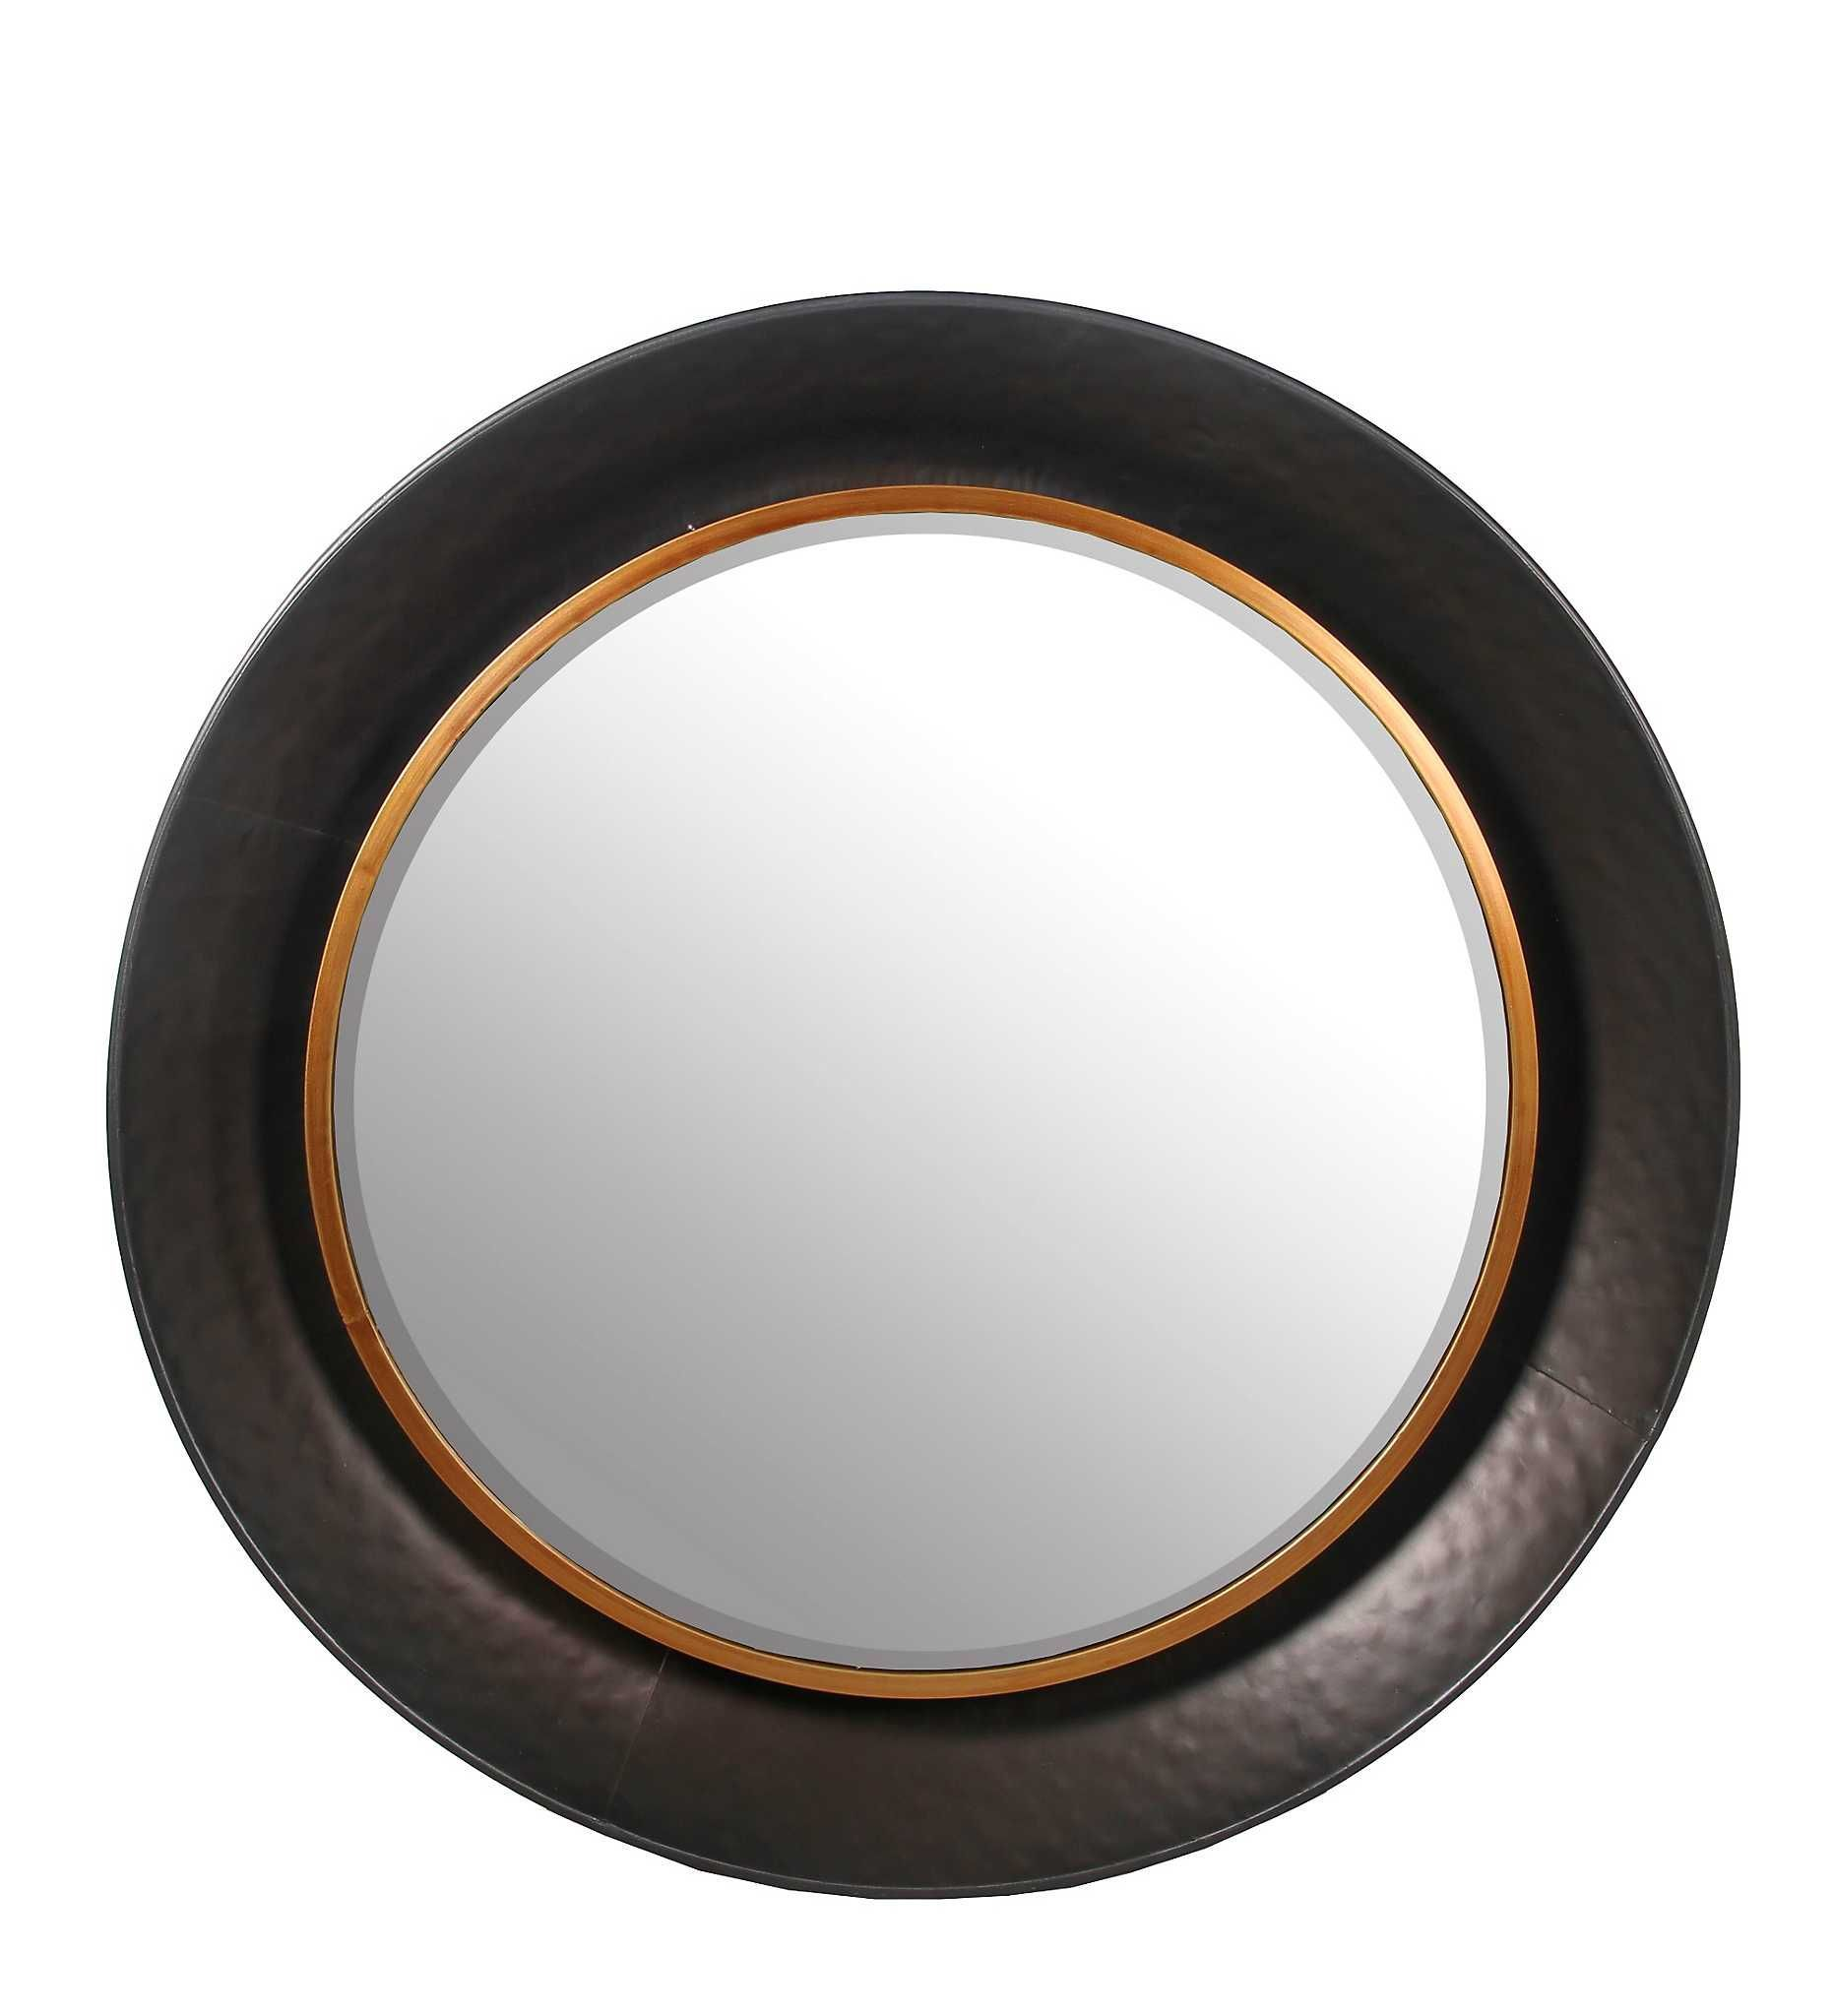 Hammered metal round wall mirror in kirklands